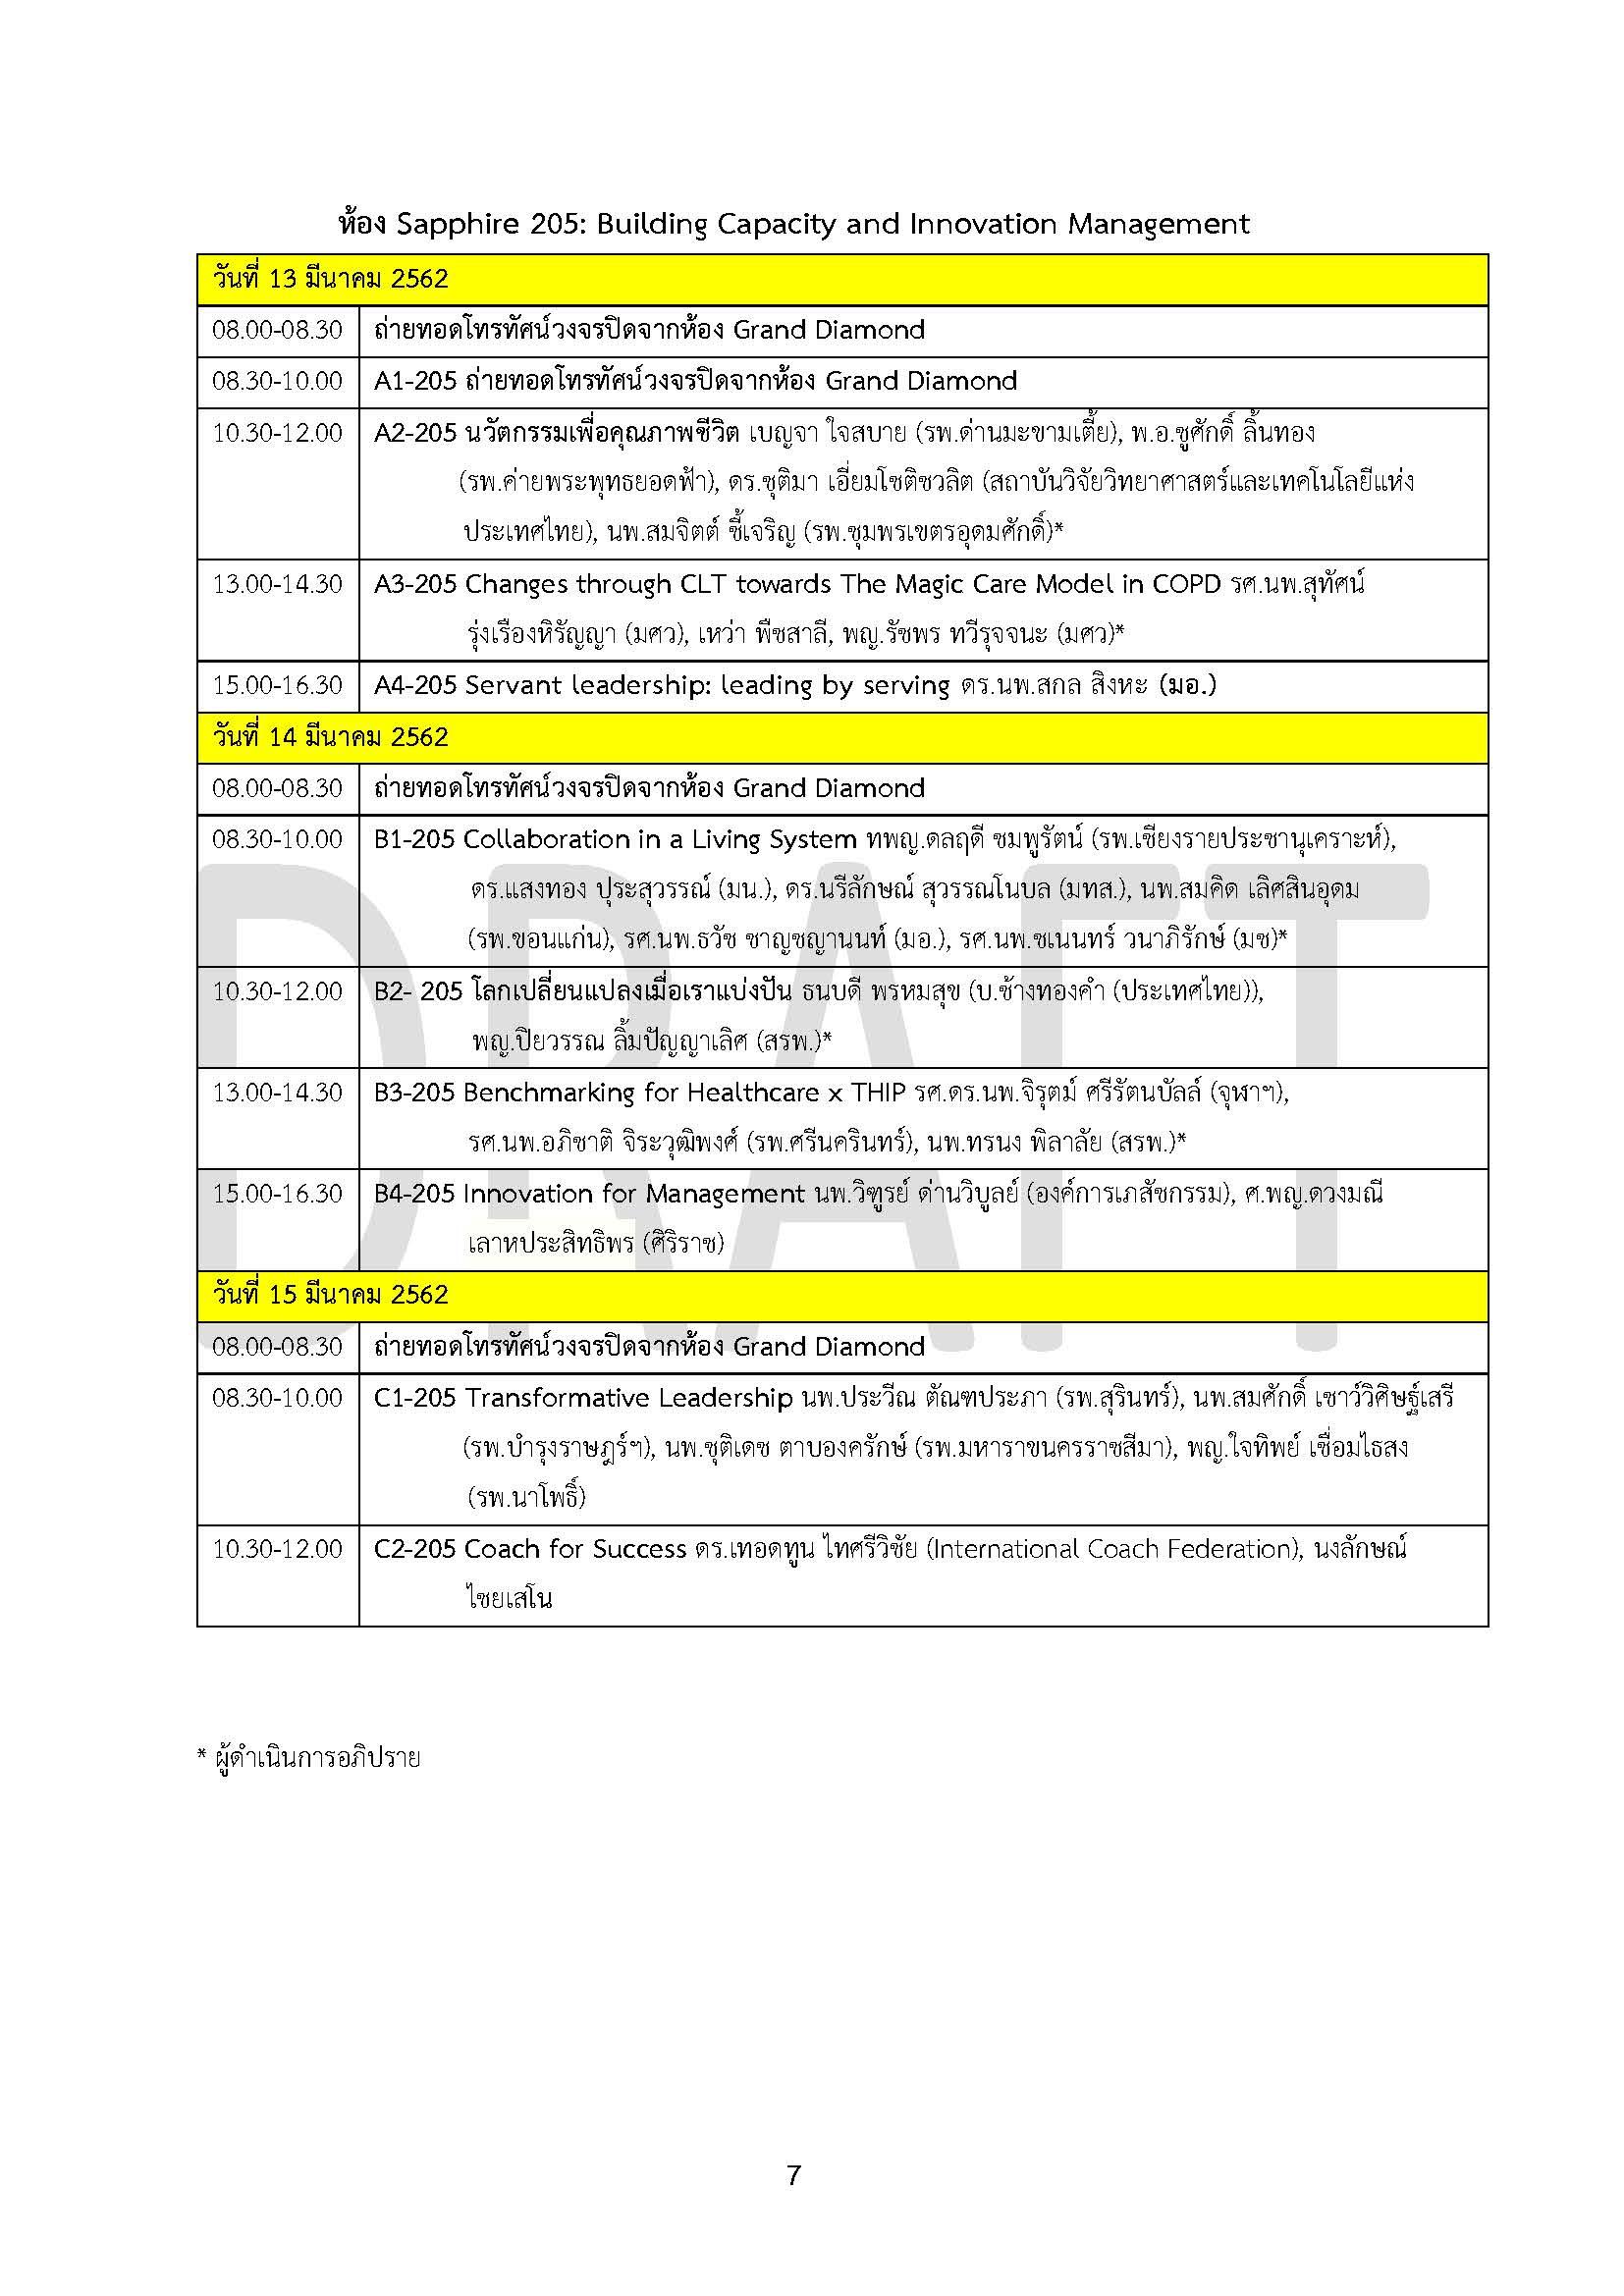 info_agenda_07